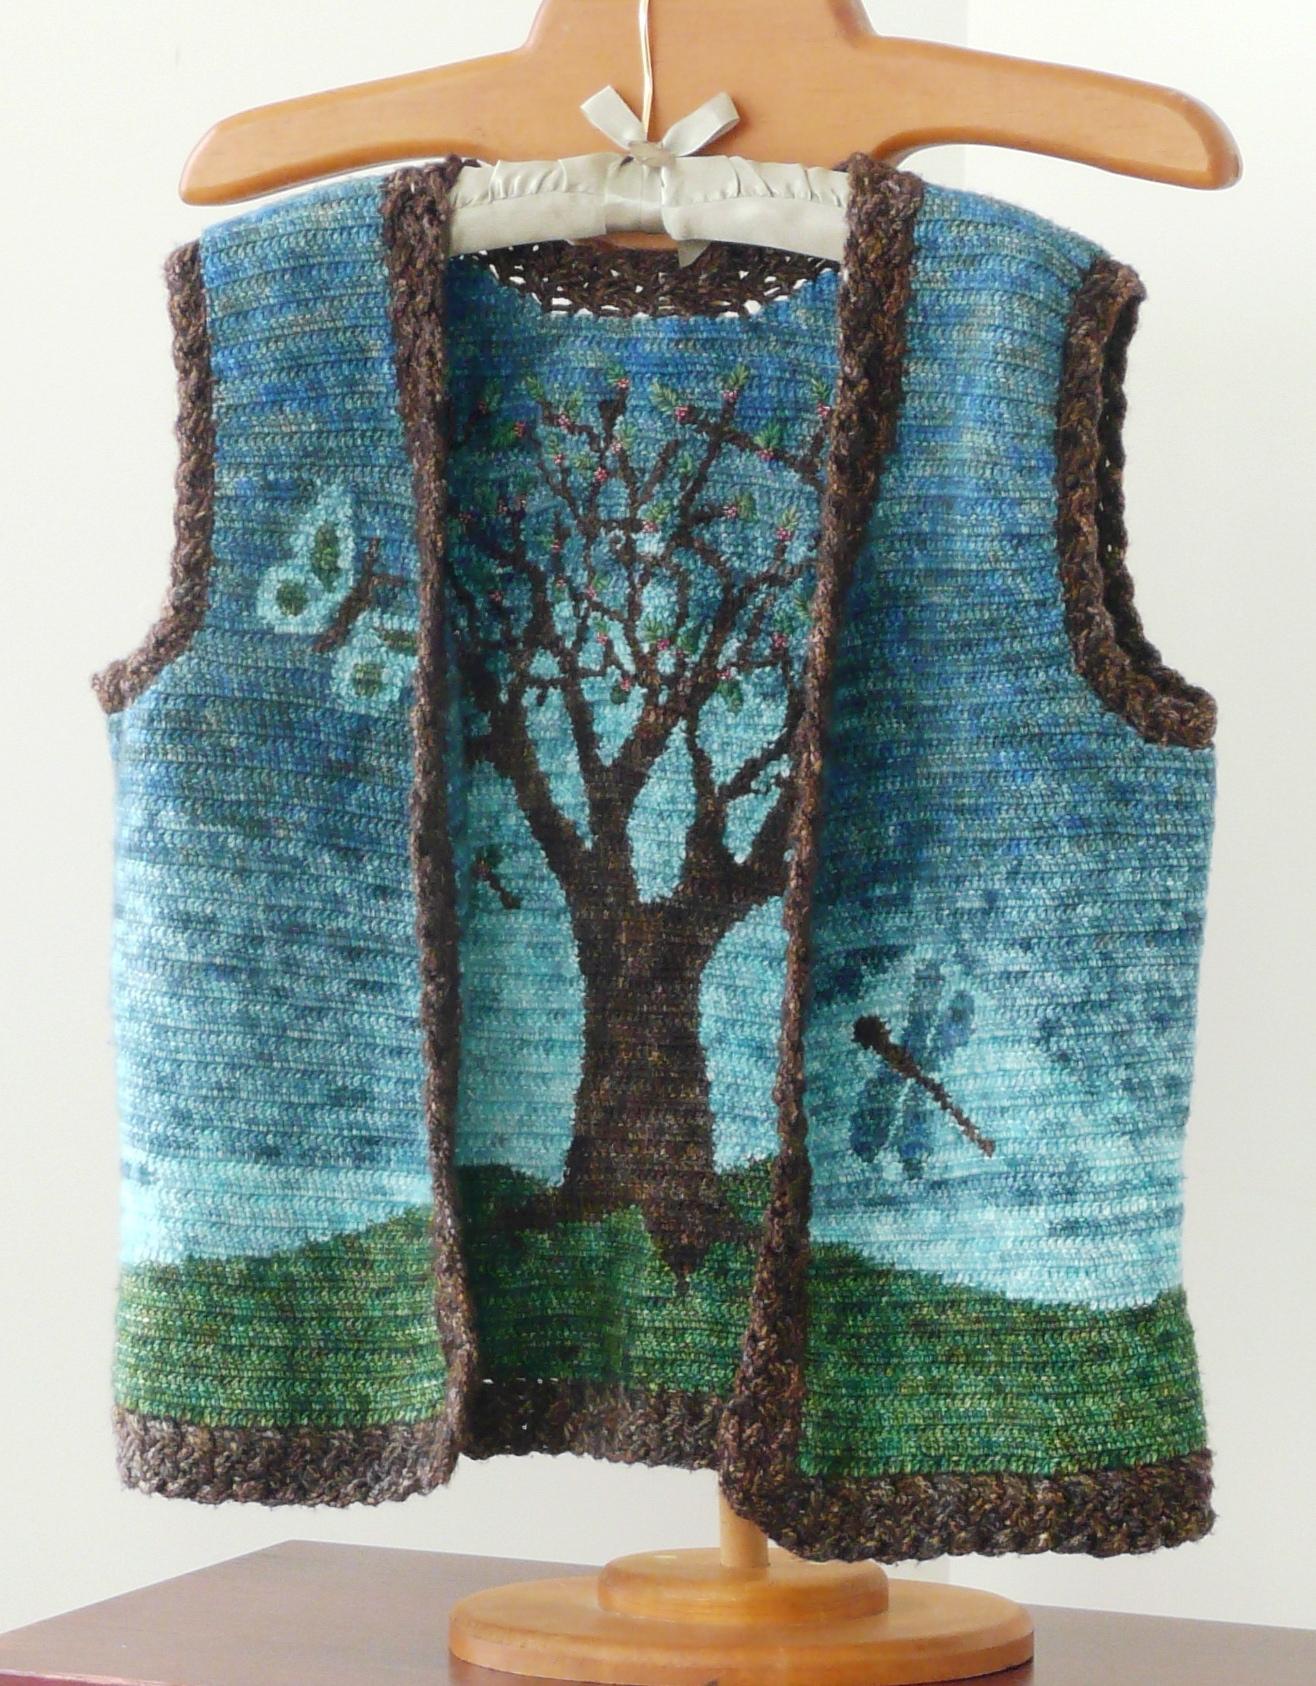 52 Reversible Rowan Tree Vest Doris Chan Crochet